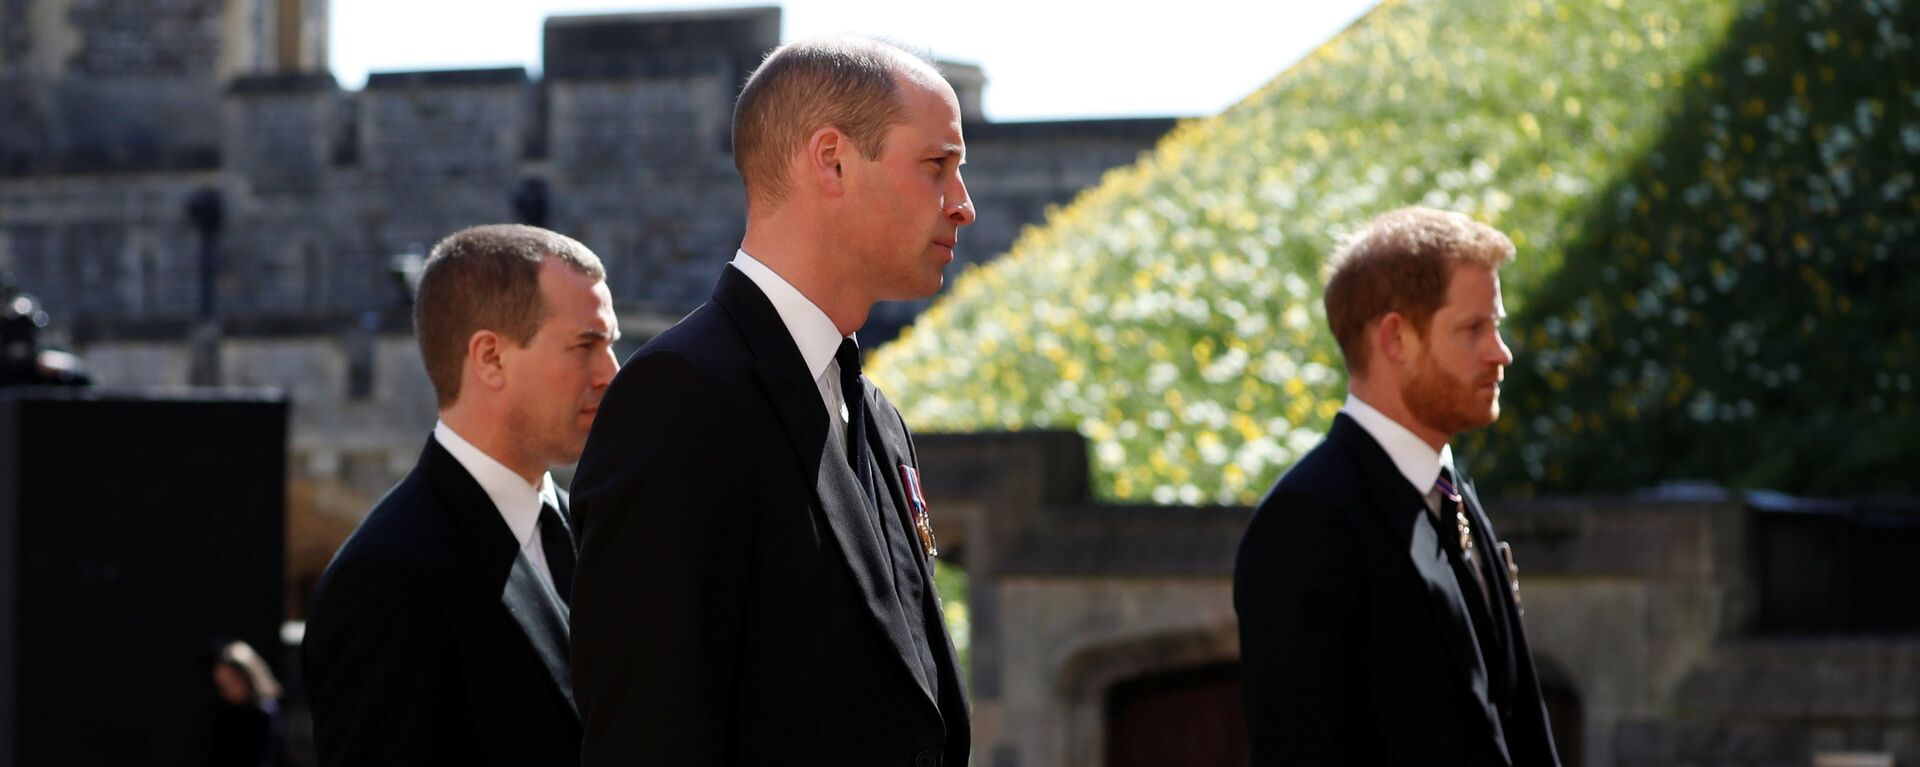 William a Harry na pohřbu prince Philipa - Sputnik Česká republika, 1920, 17.04.2021